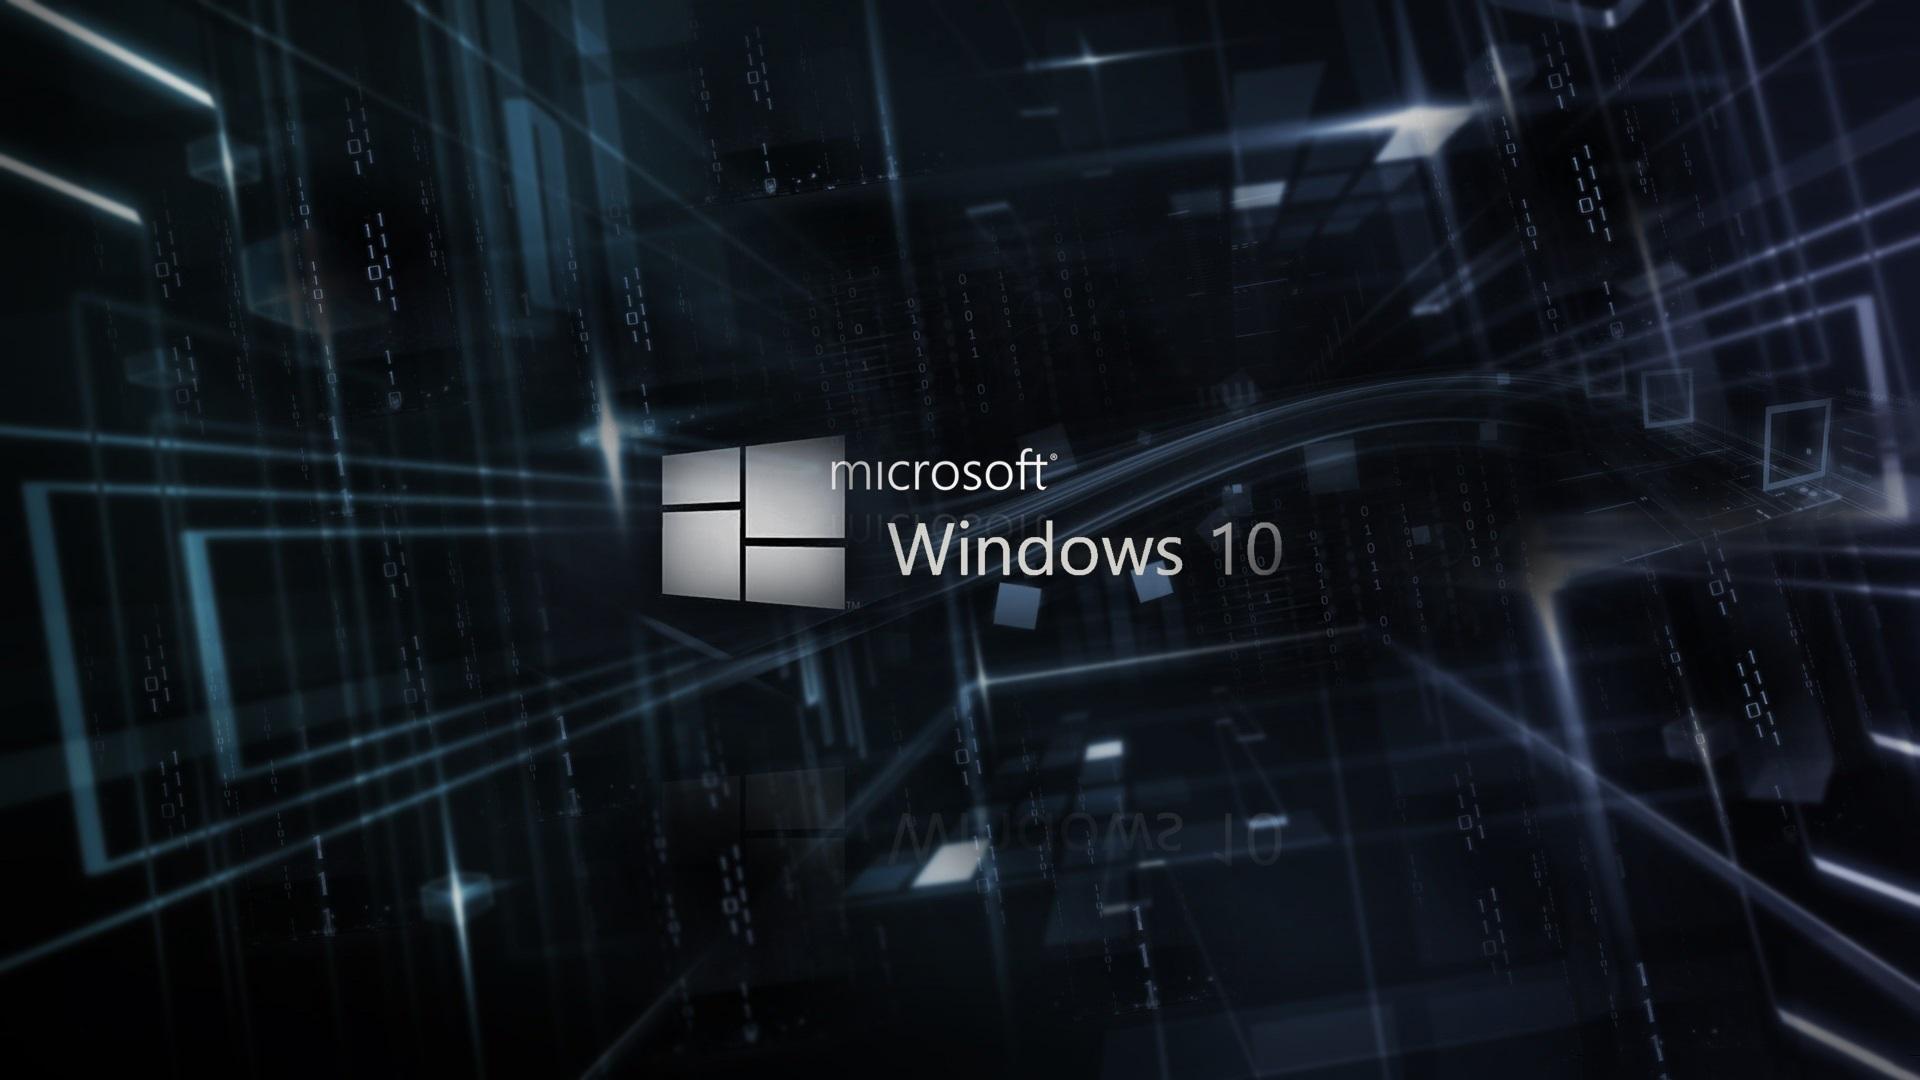 wallpaper microsoft windows 10 logo 3d background 1920x1080 full hd